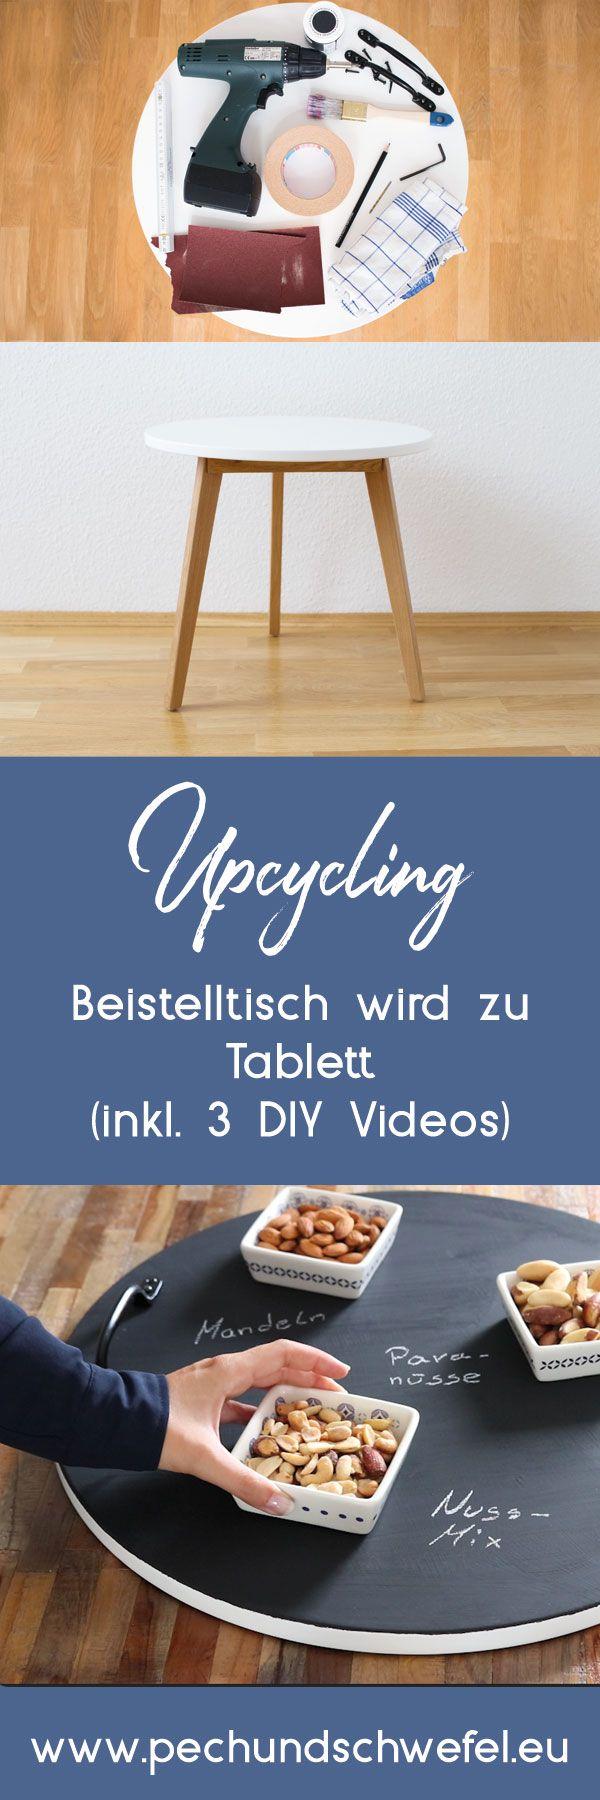 DIY Upcycling: Wie man aus alten Möbeln neue Lieblingsstücke macht - Pech & Schwefel